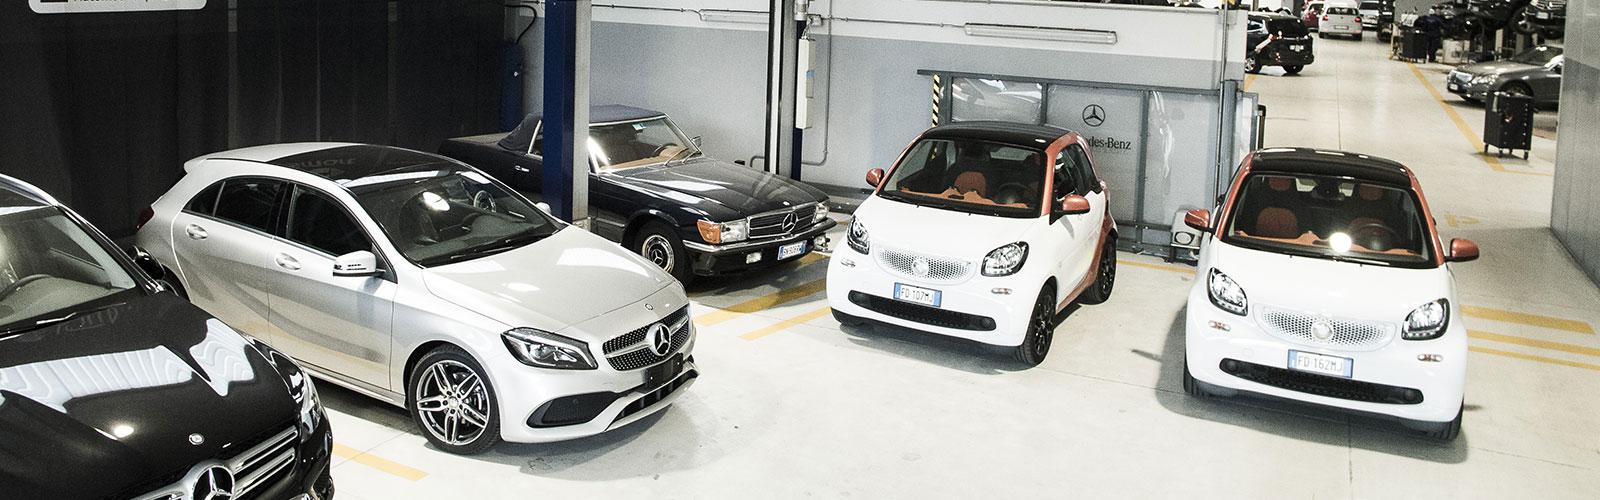 Vantaggi Fiscali Noleggio Lungo Termine Sintesi Automotive srl Milano